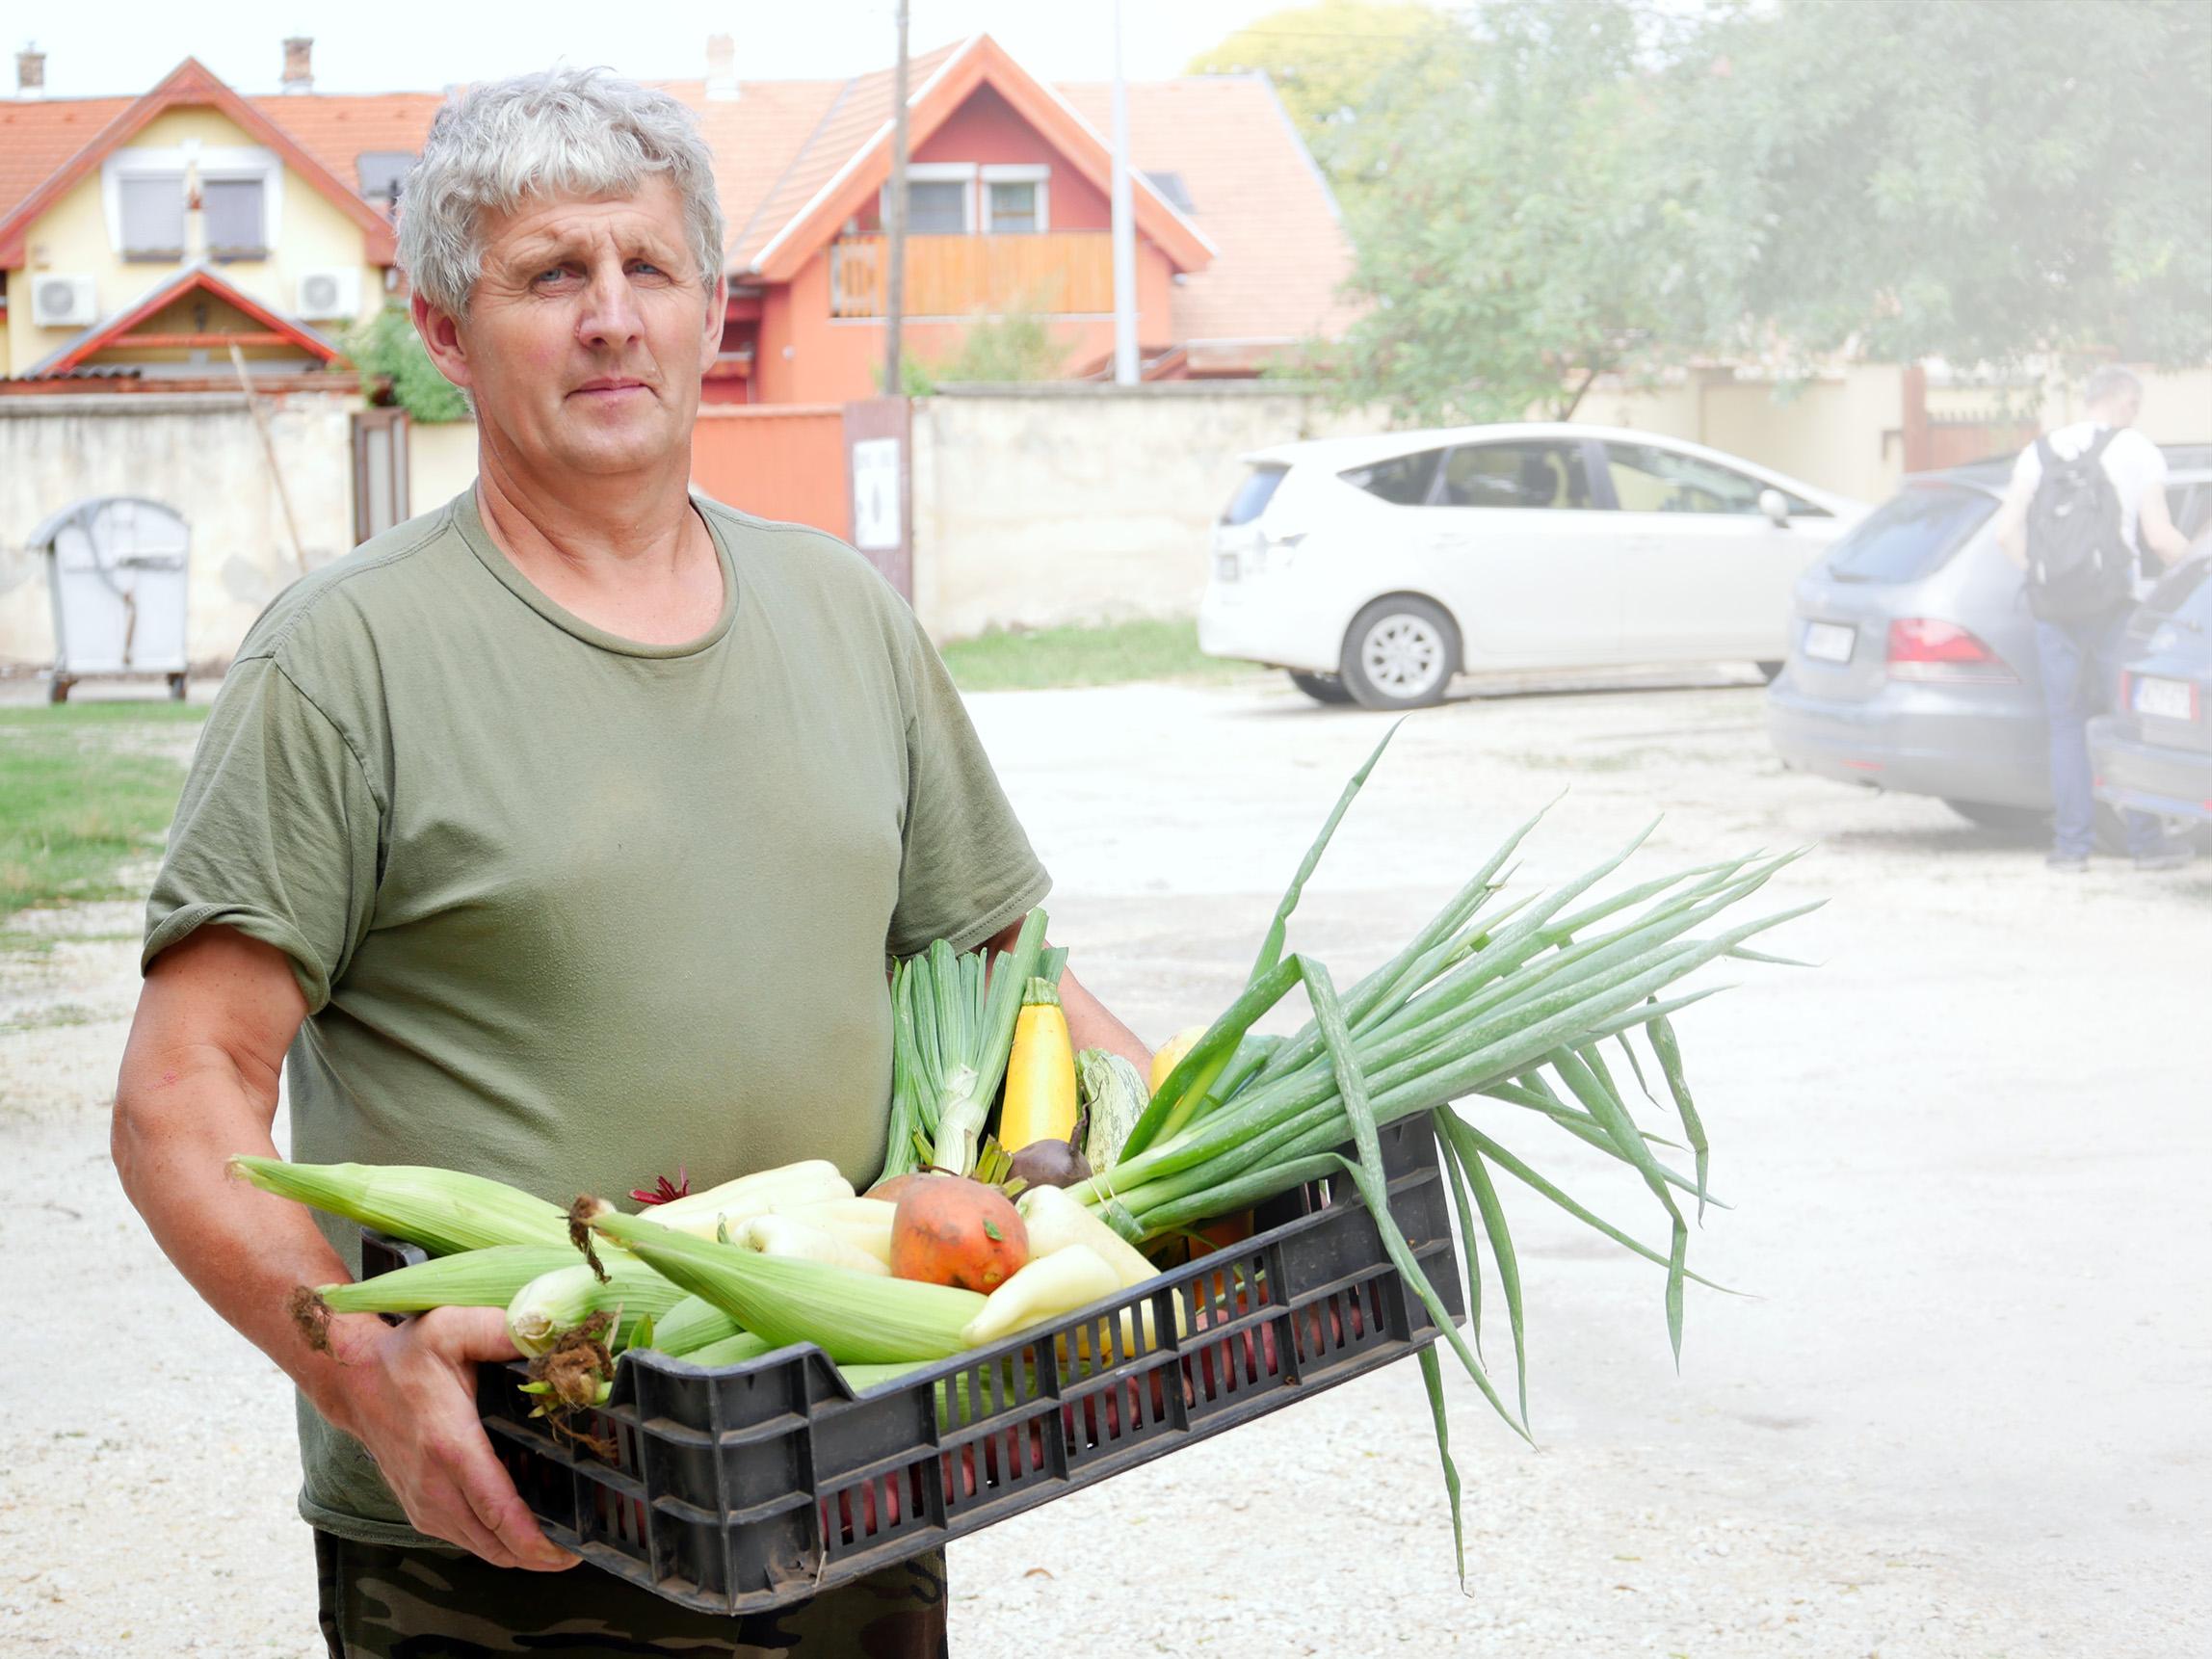 Rózsa Imre biogazda, őstermelő - BioRózsa